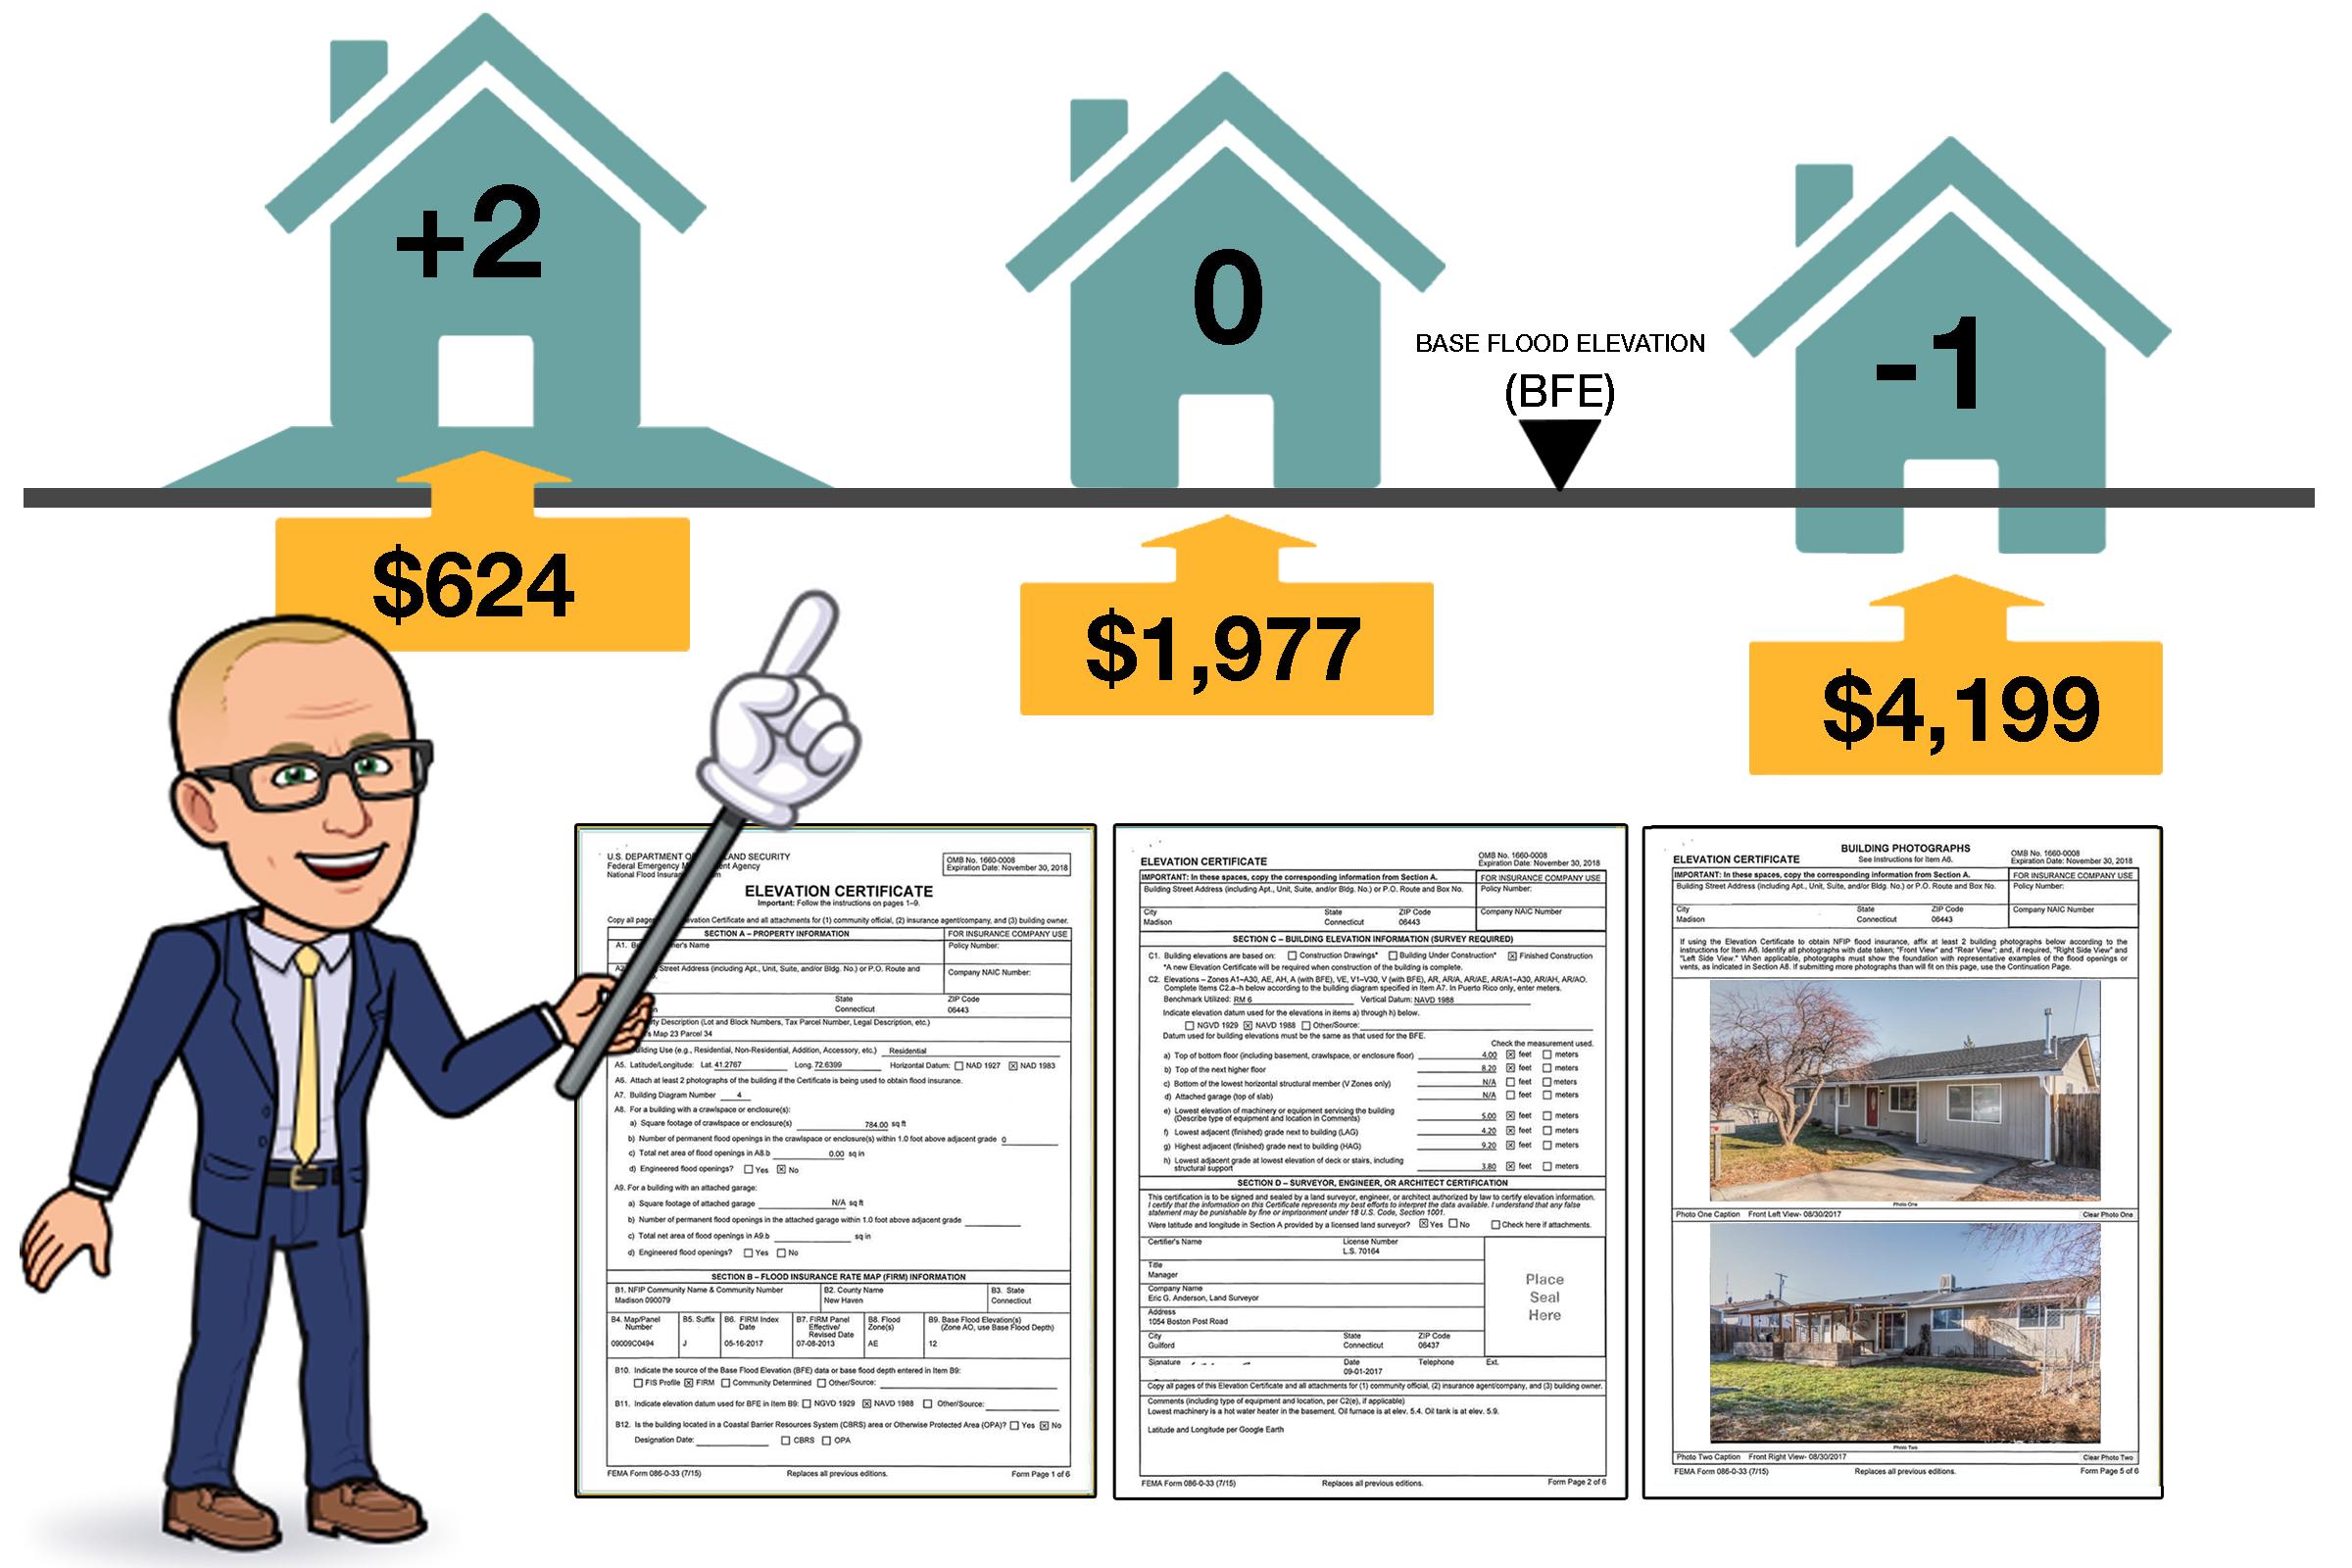 Flood nerd explains how an Elevation Certificate can effect your NFIP premium